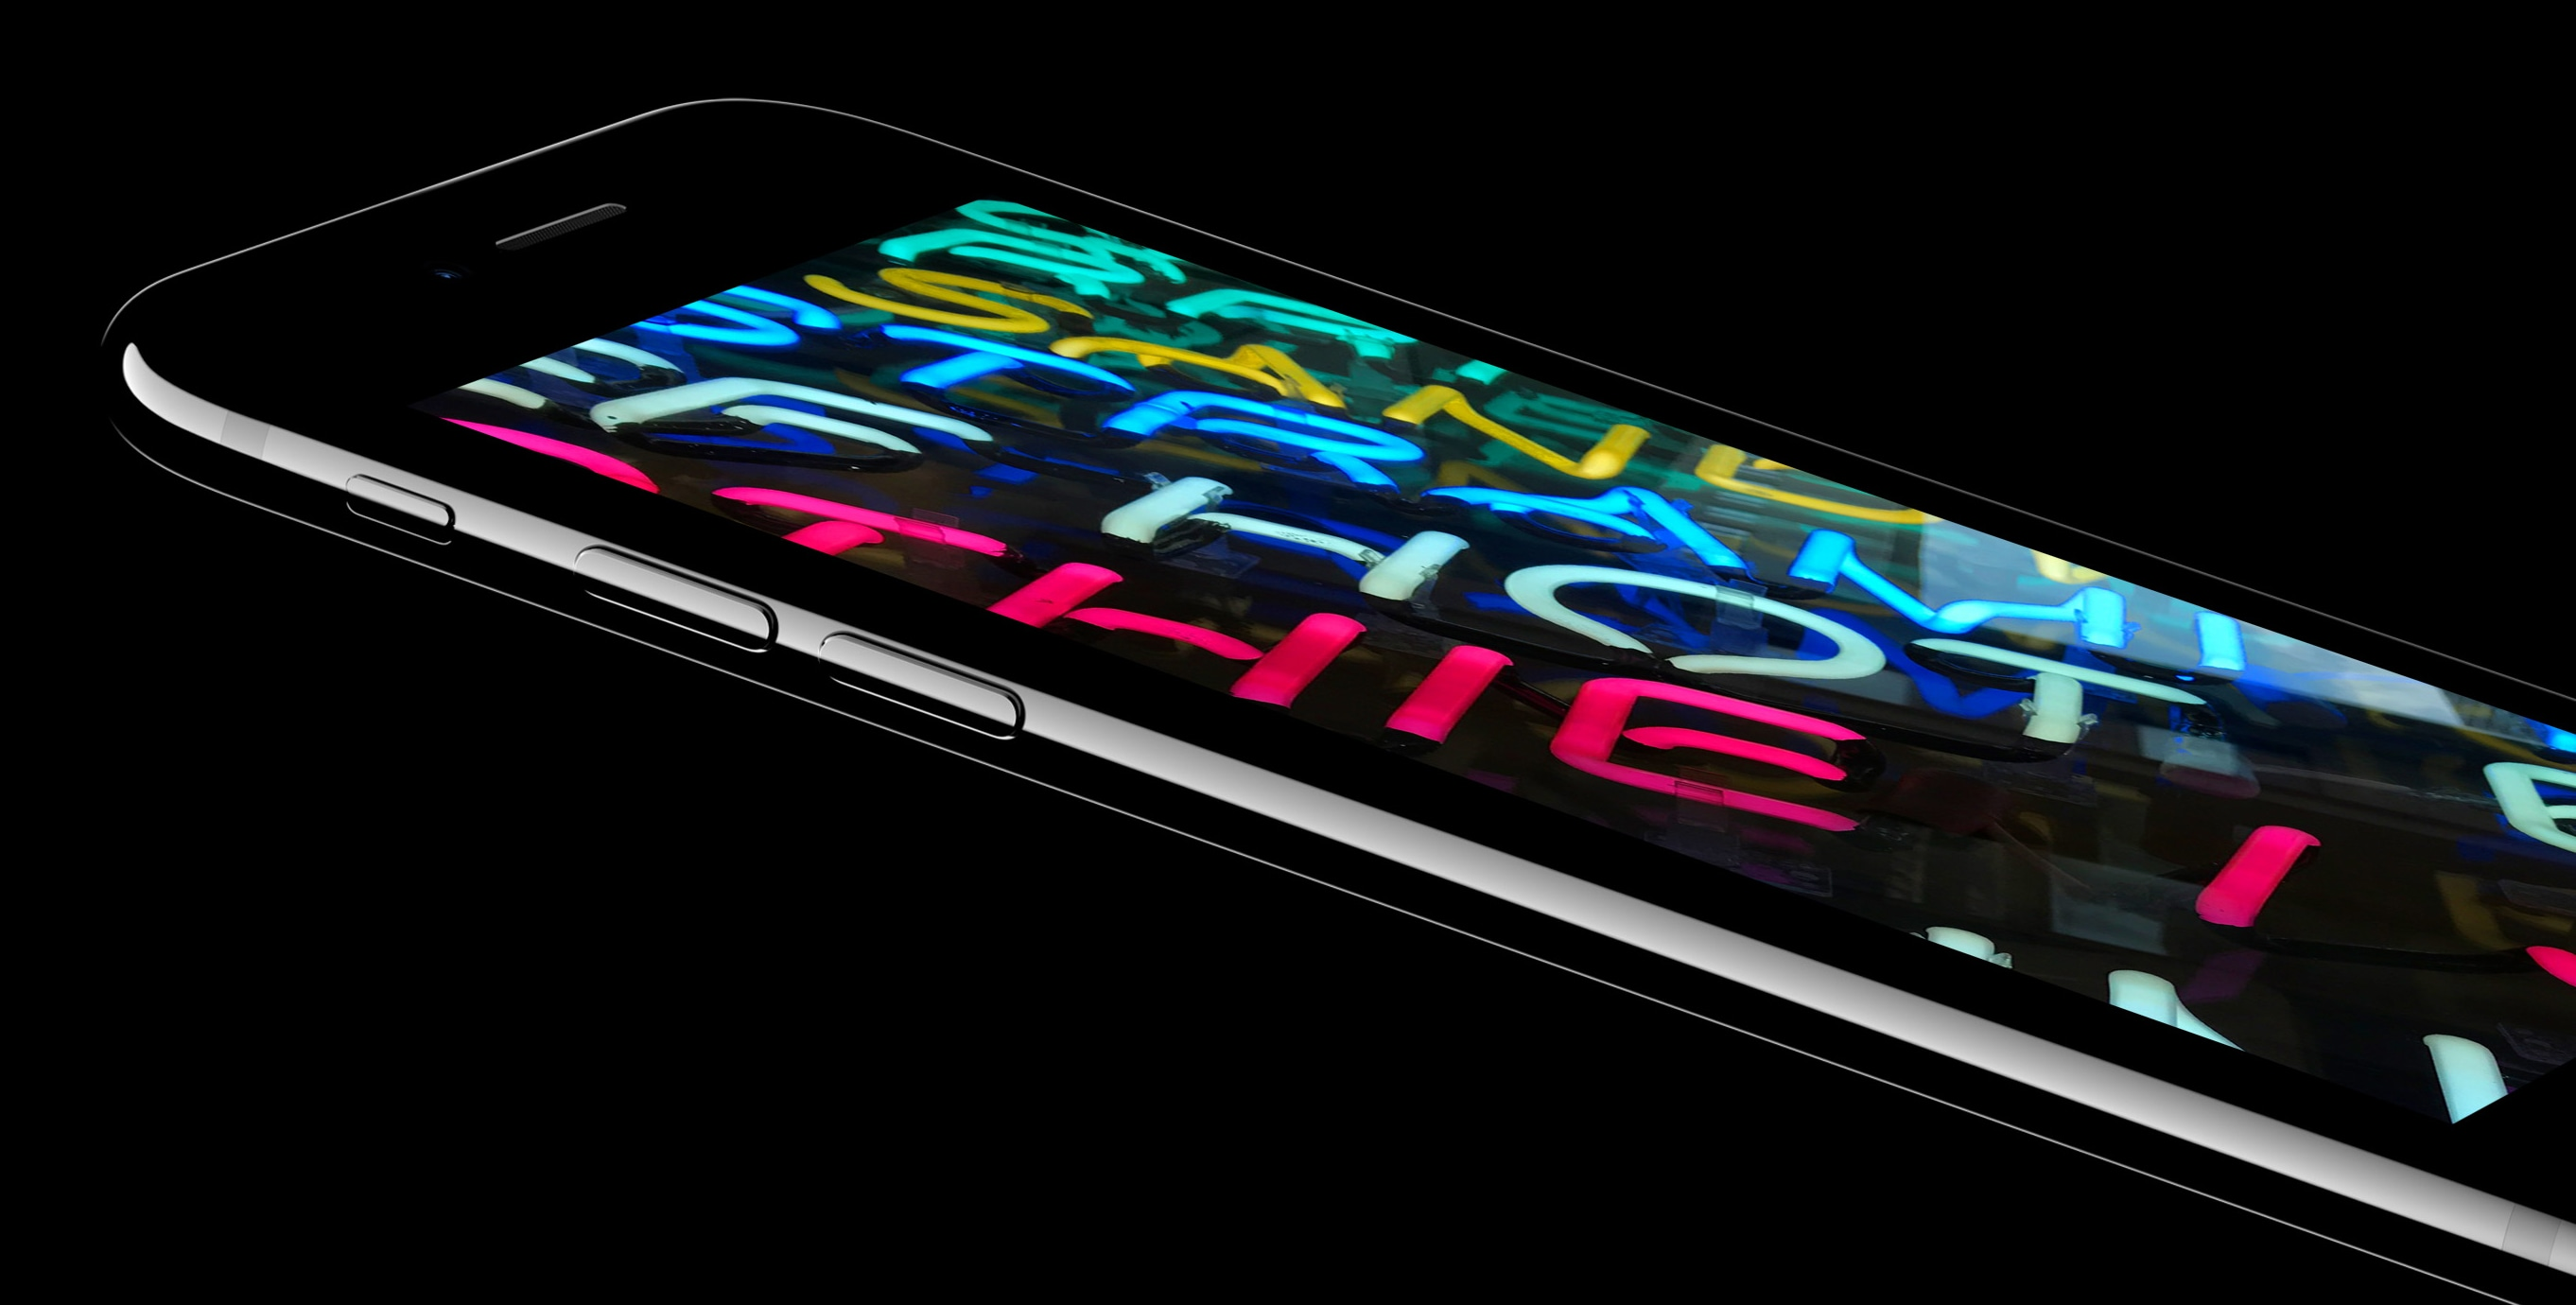 Tela/display do iPhone 7